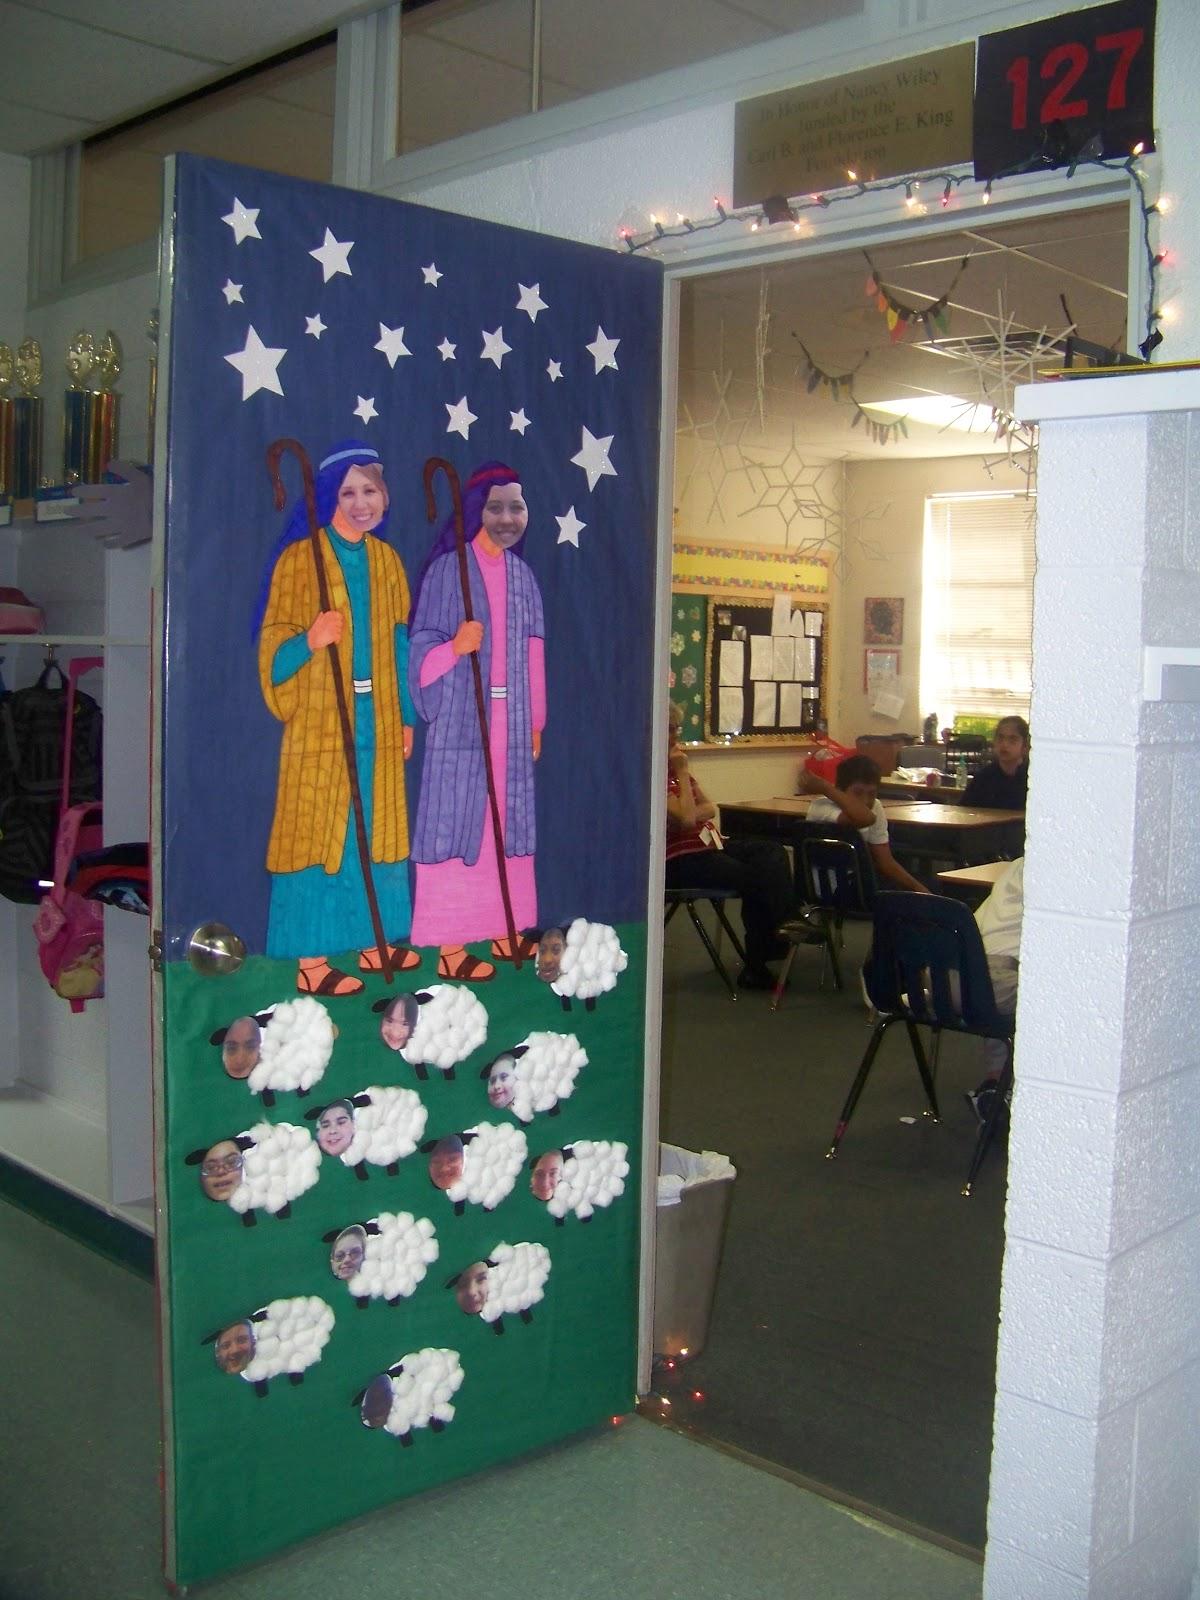 Door Decorations Christmas Contest School - i did this ...